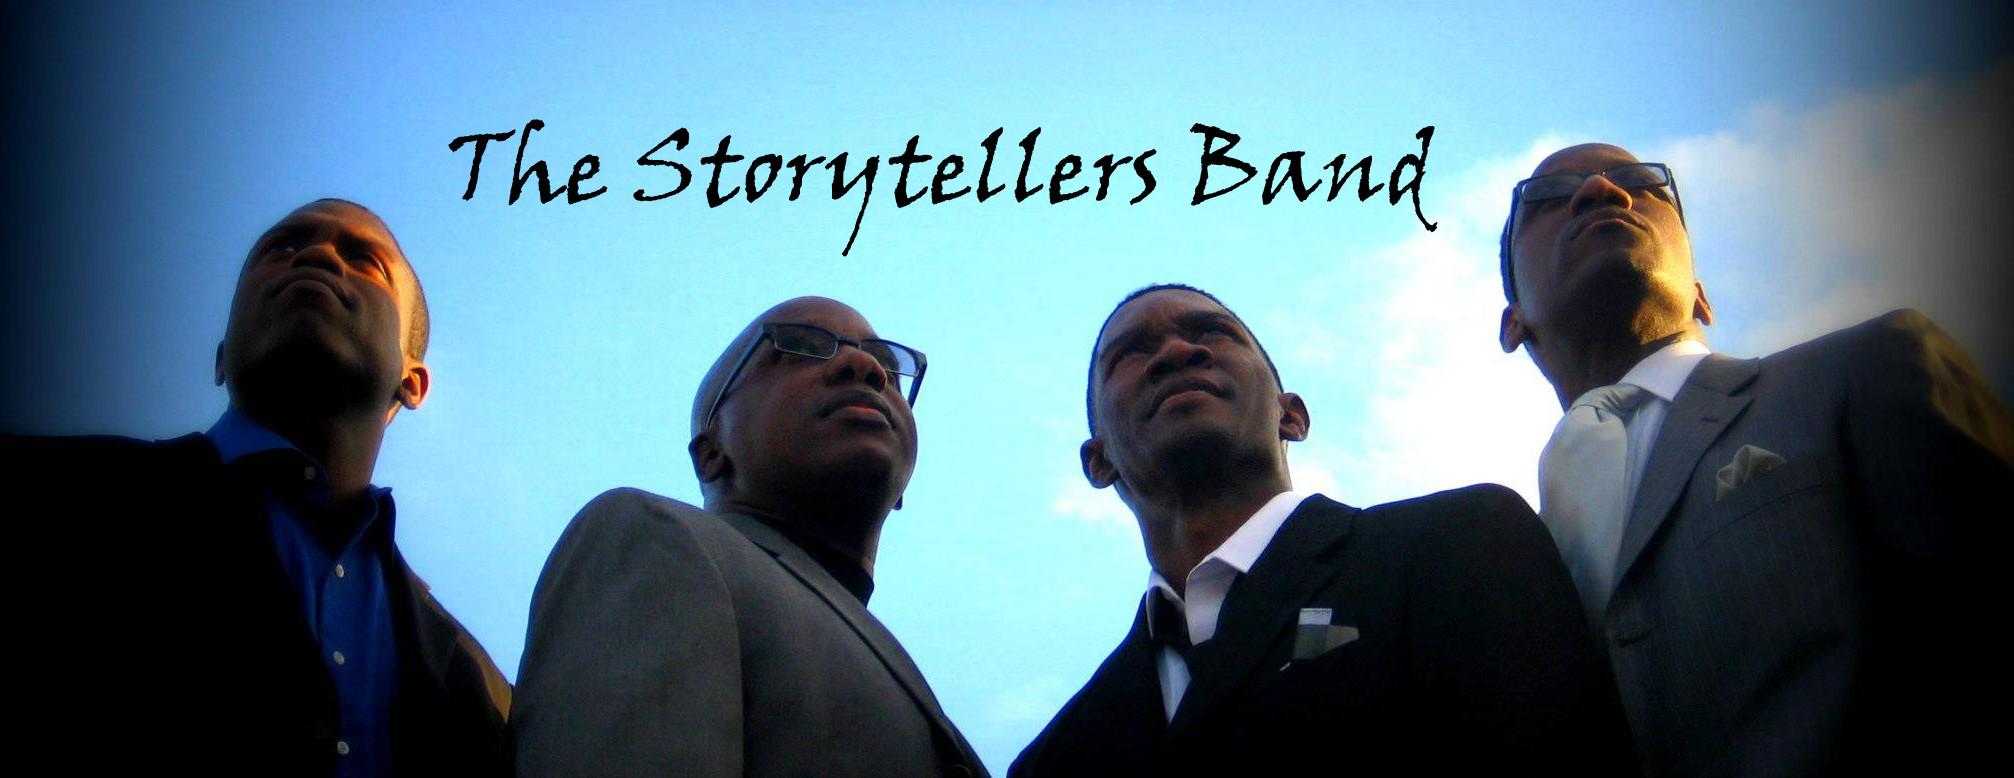 TheStorytellers